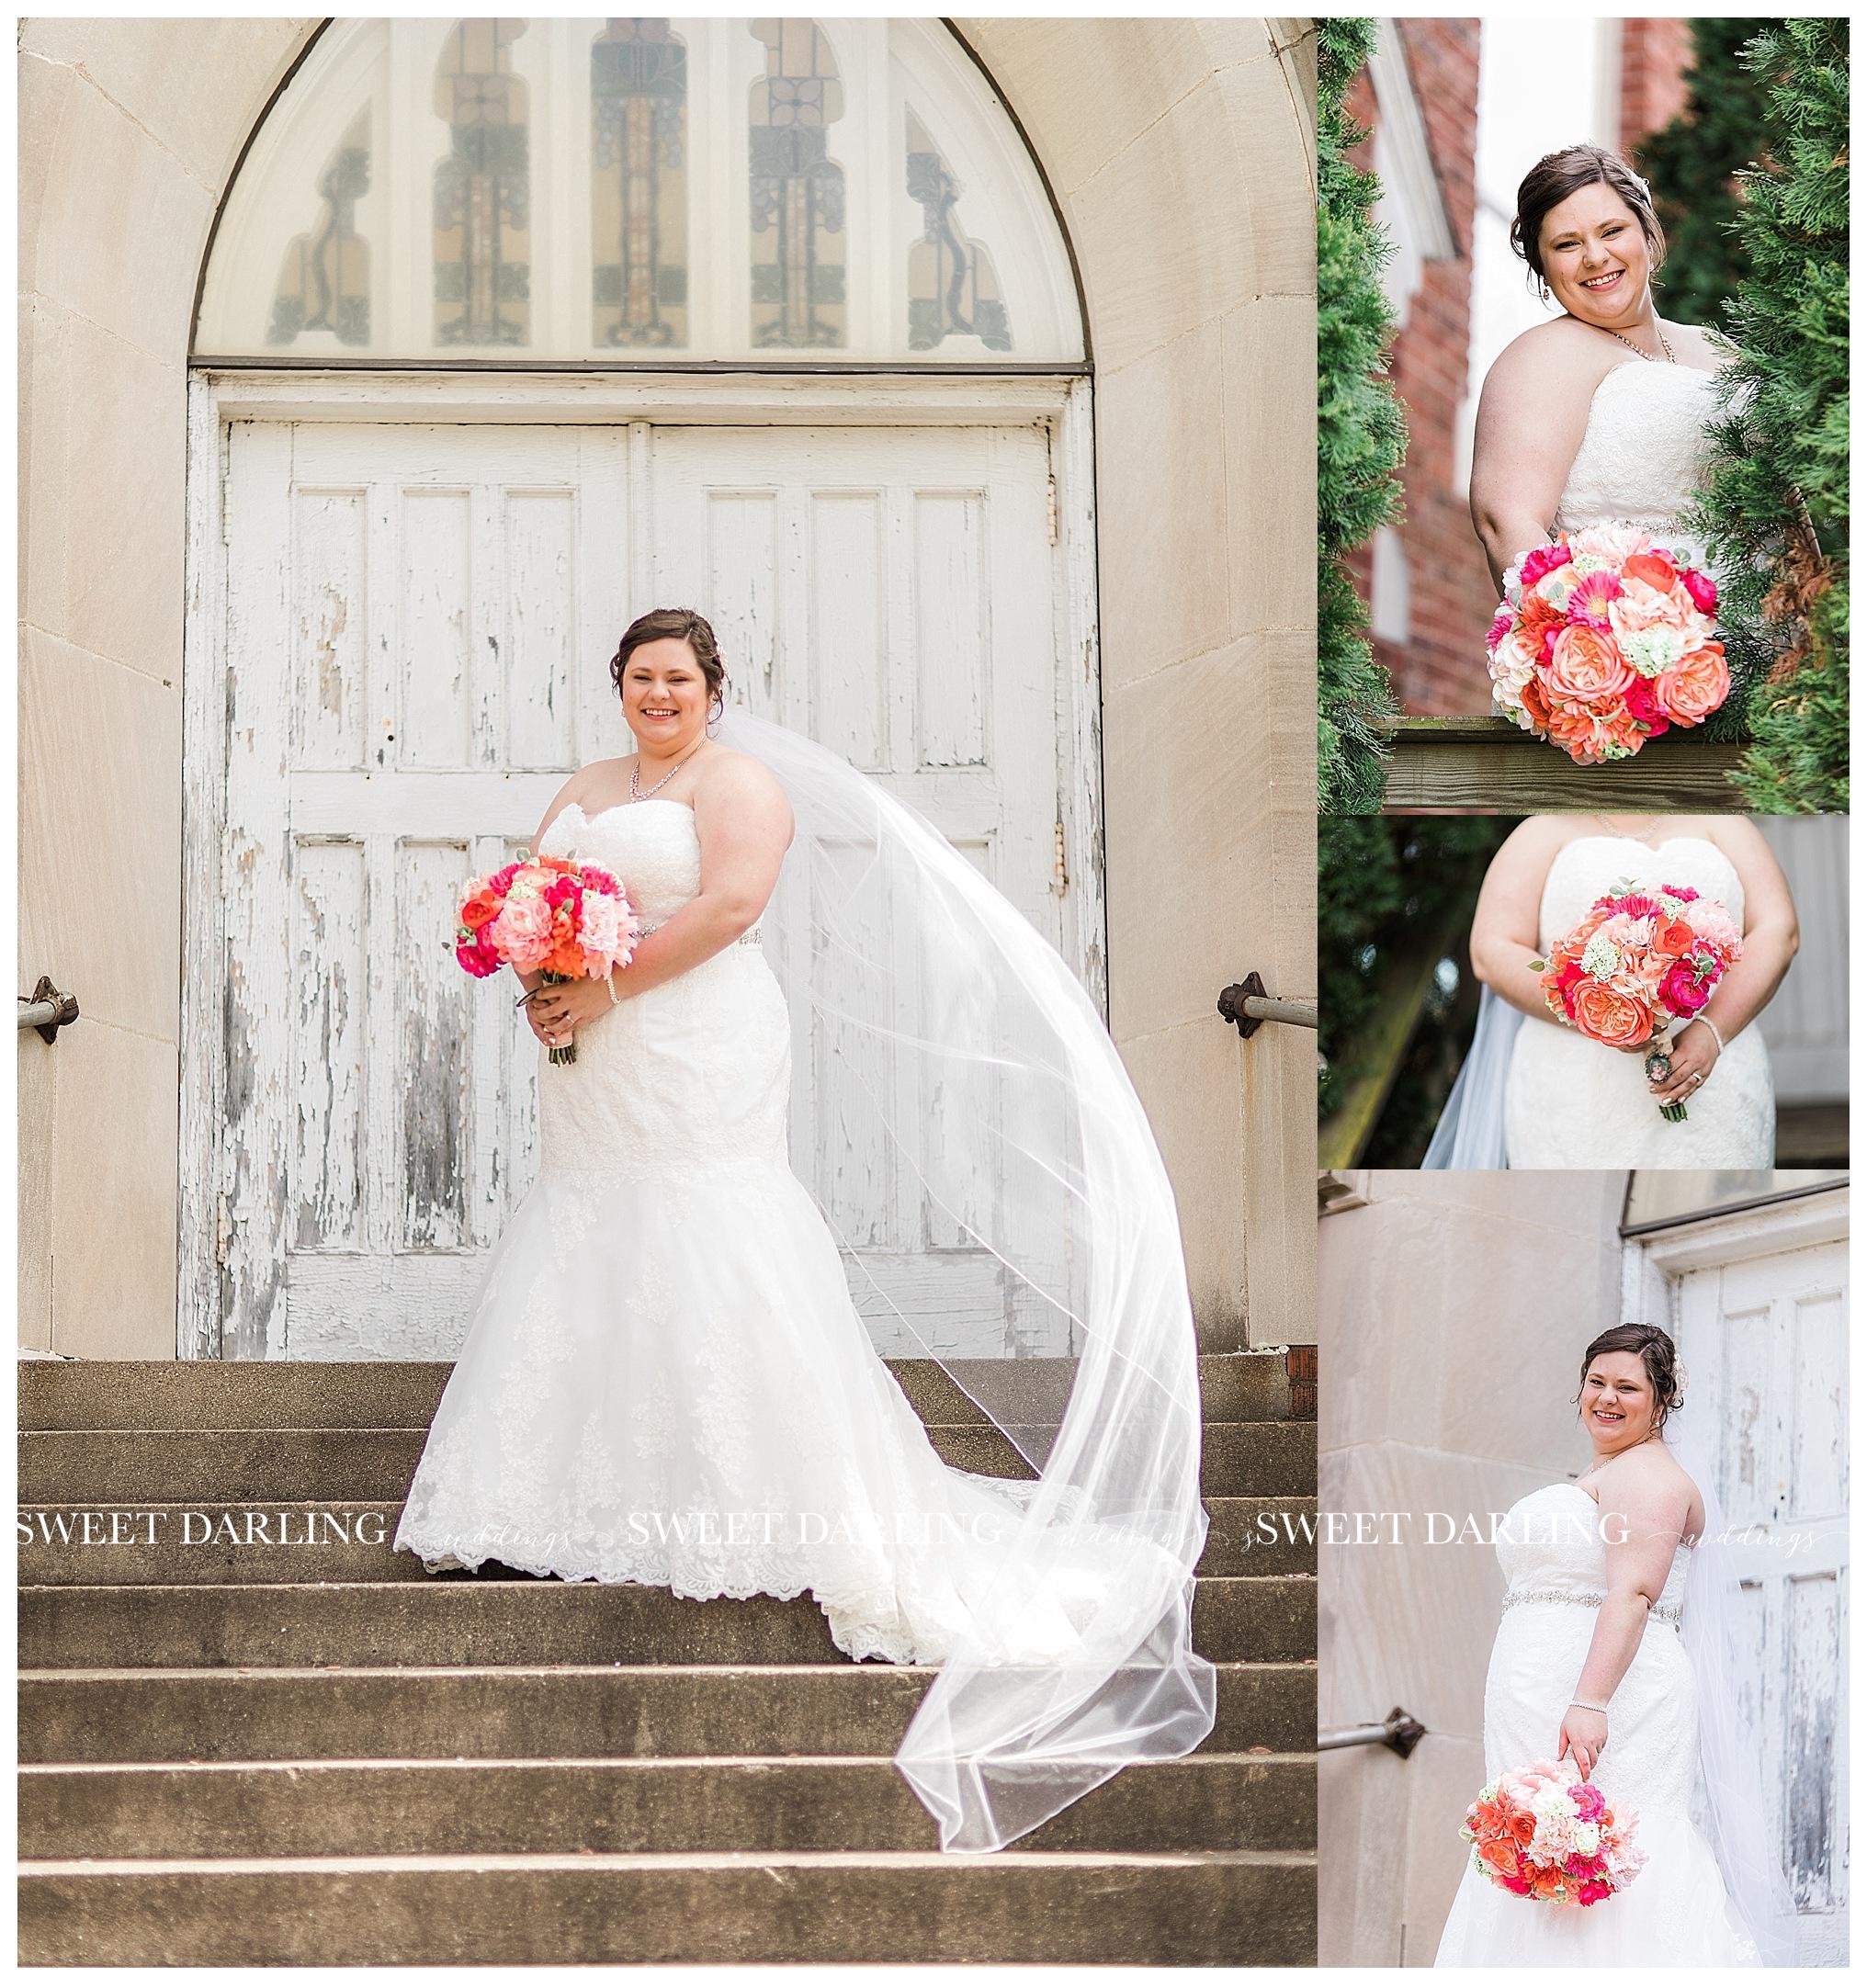 arcoloa-illinois-coles-county-wedding-photography-sweet-darling-weddings-photographer_0945.jpg